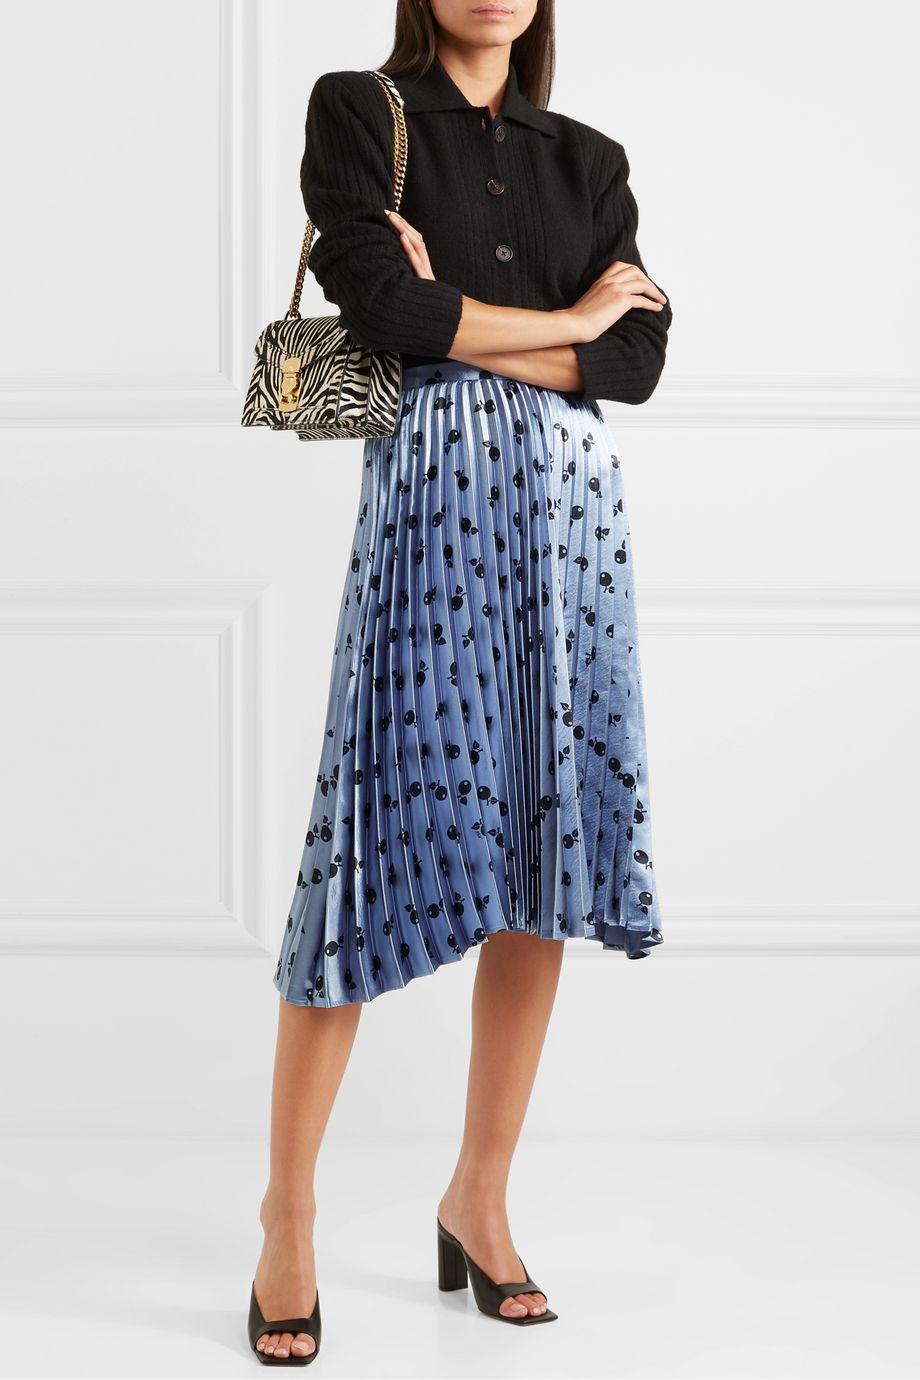 HVN Tracy metallic printed pleated satin midi skirt